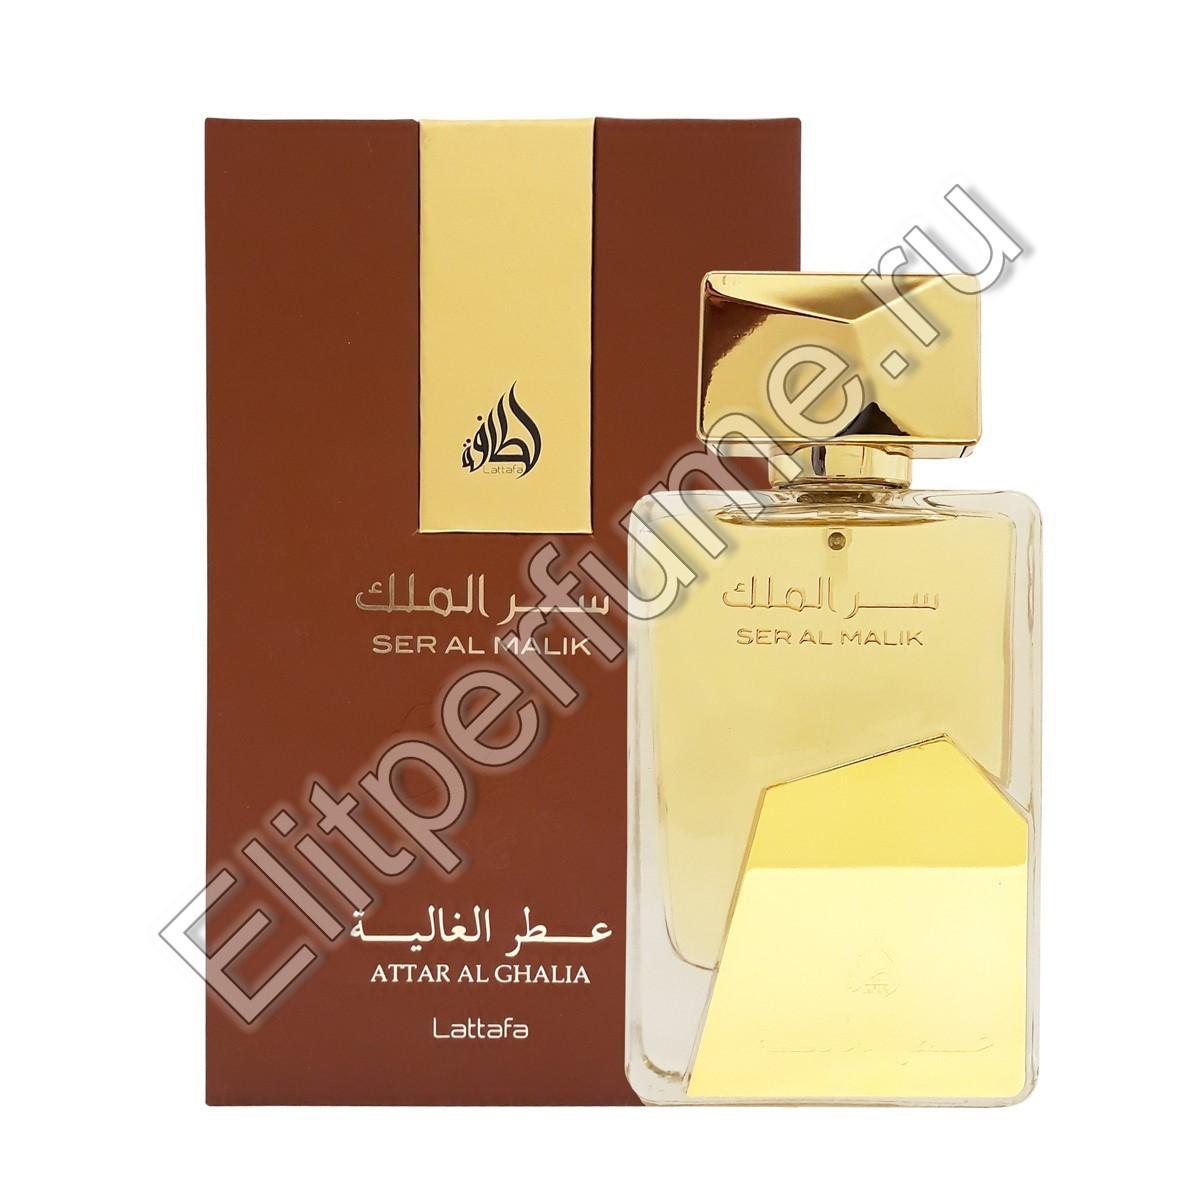 SER AL MALIK men EDP 100 мл спрей от Lattafa Латтафа